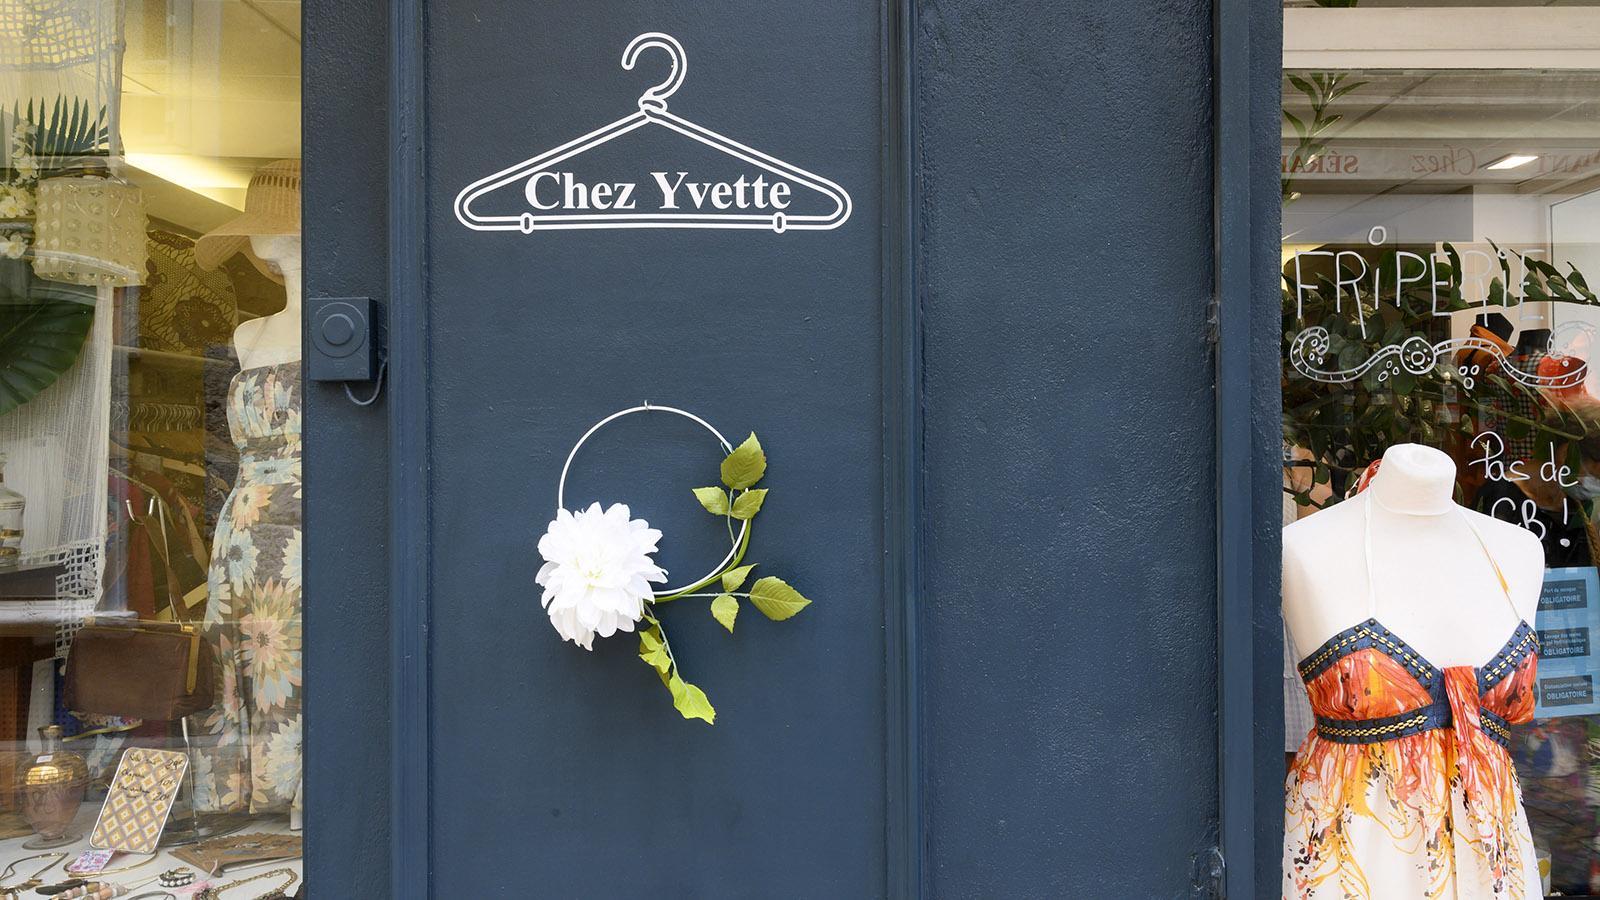 Schöner Second-Hand-Laden in der Altstadt: Chez Yvette. Foto: Hilke Maunder